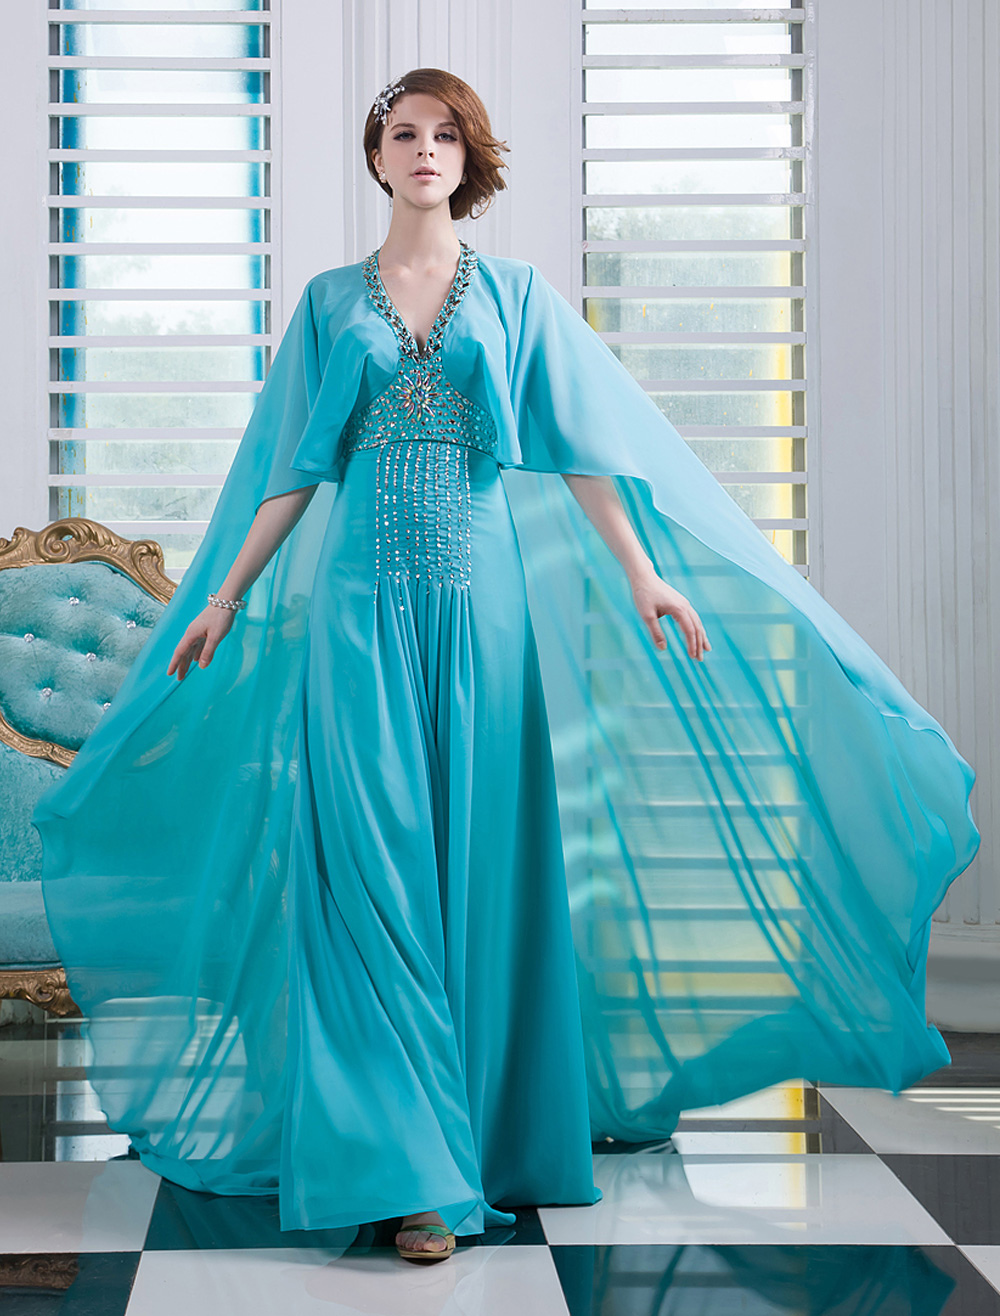 Chiffon Evening Dress Turquoise Beaded Prom Dress V Neck Sleeveless A Line Floor Length Party Dress With Watteau Train  Milanoo